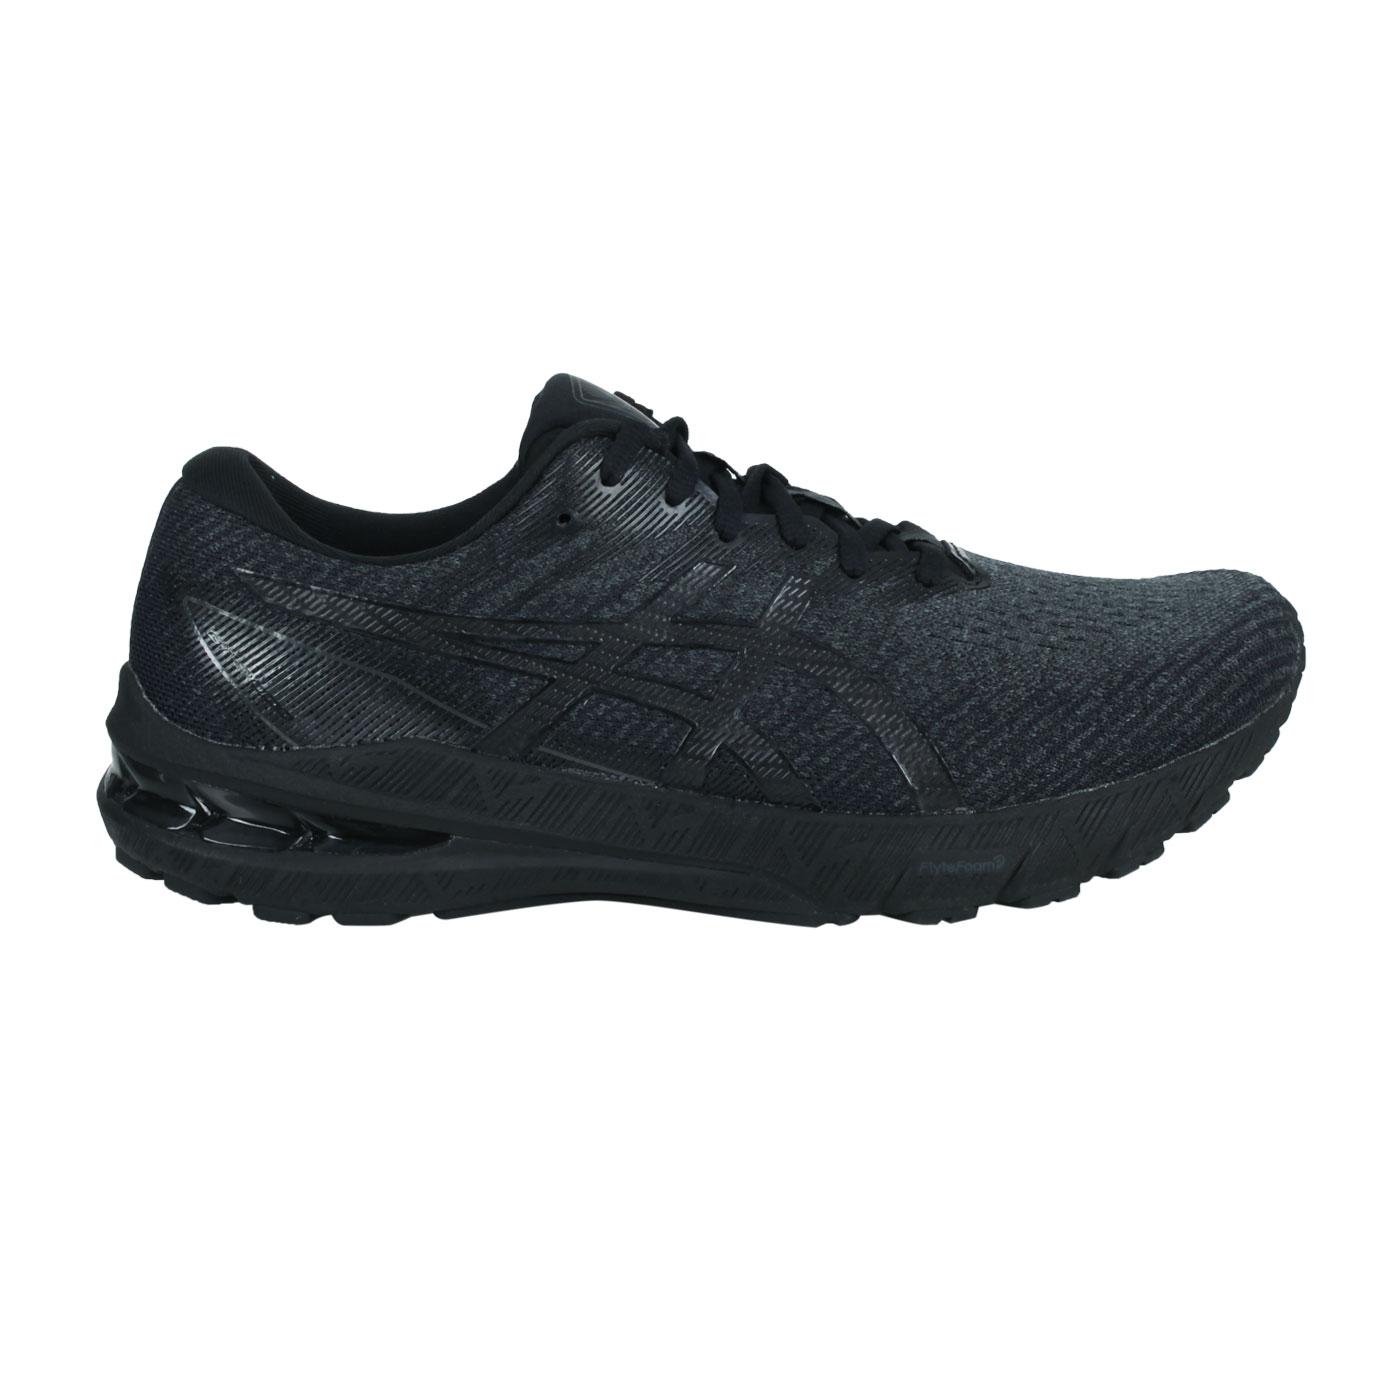 ASICS 男款慢跑鞋-2E  @GT-2000 10@1011B186-001